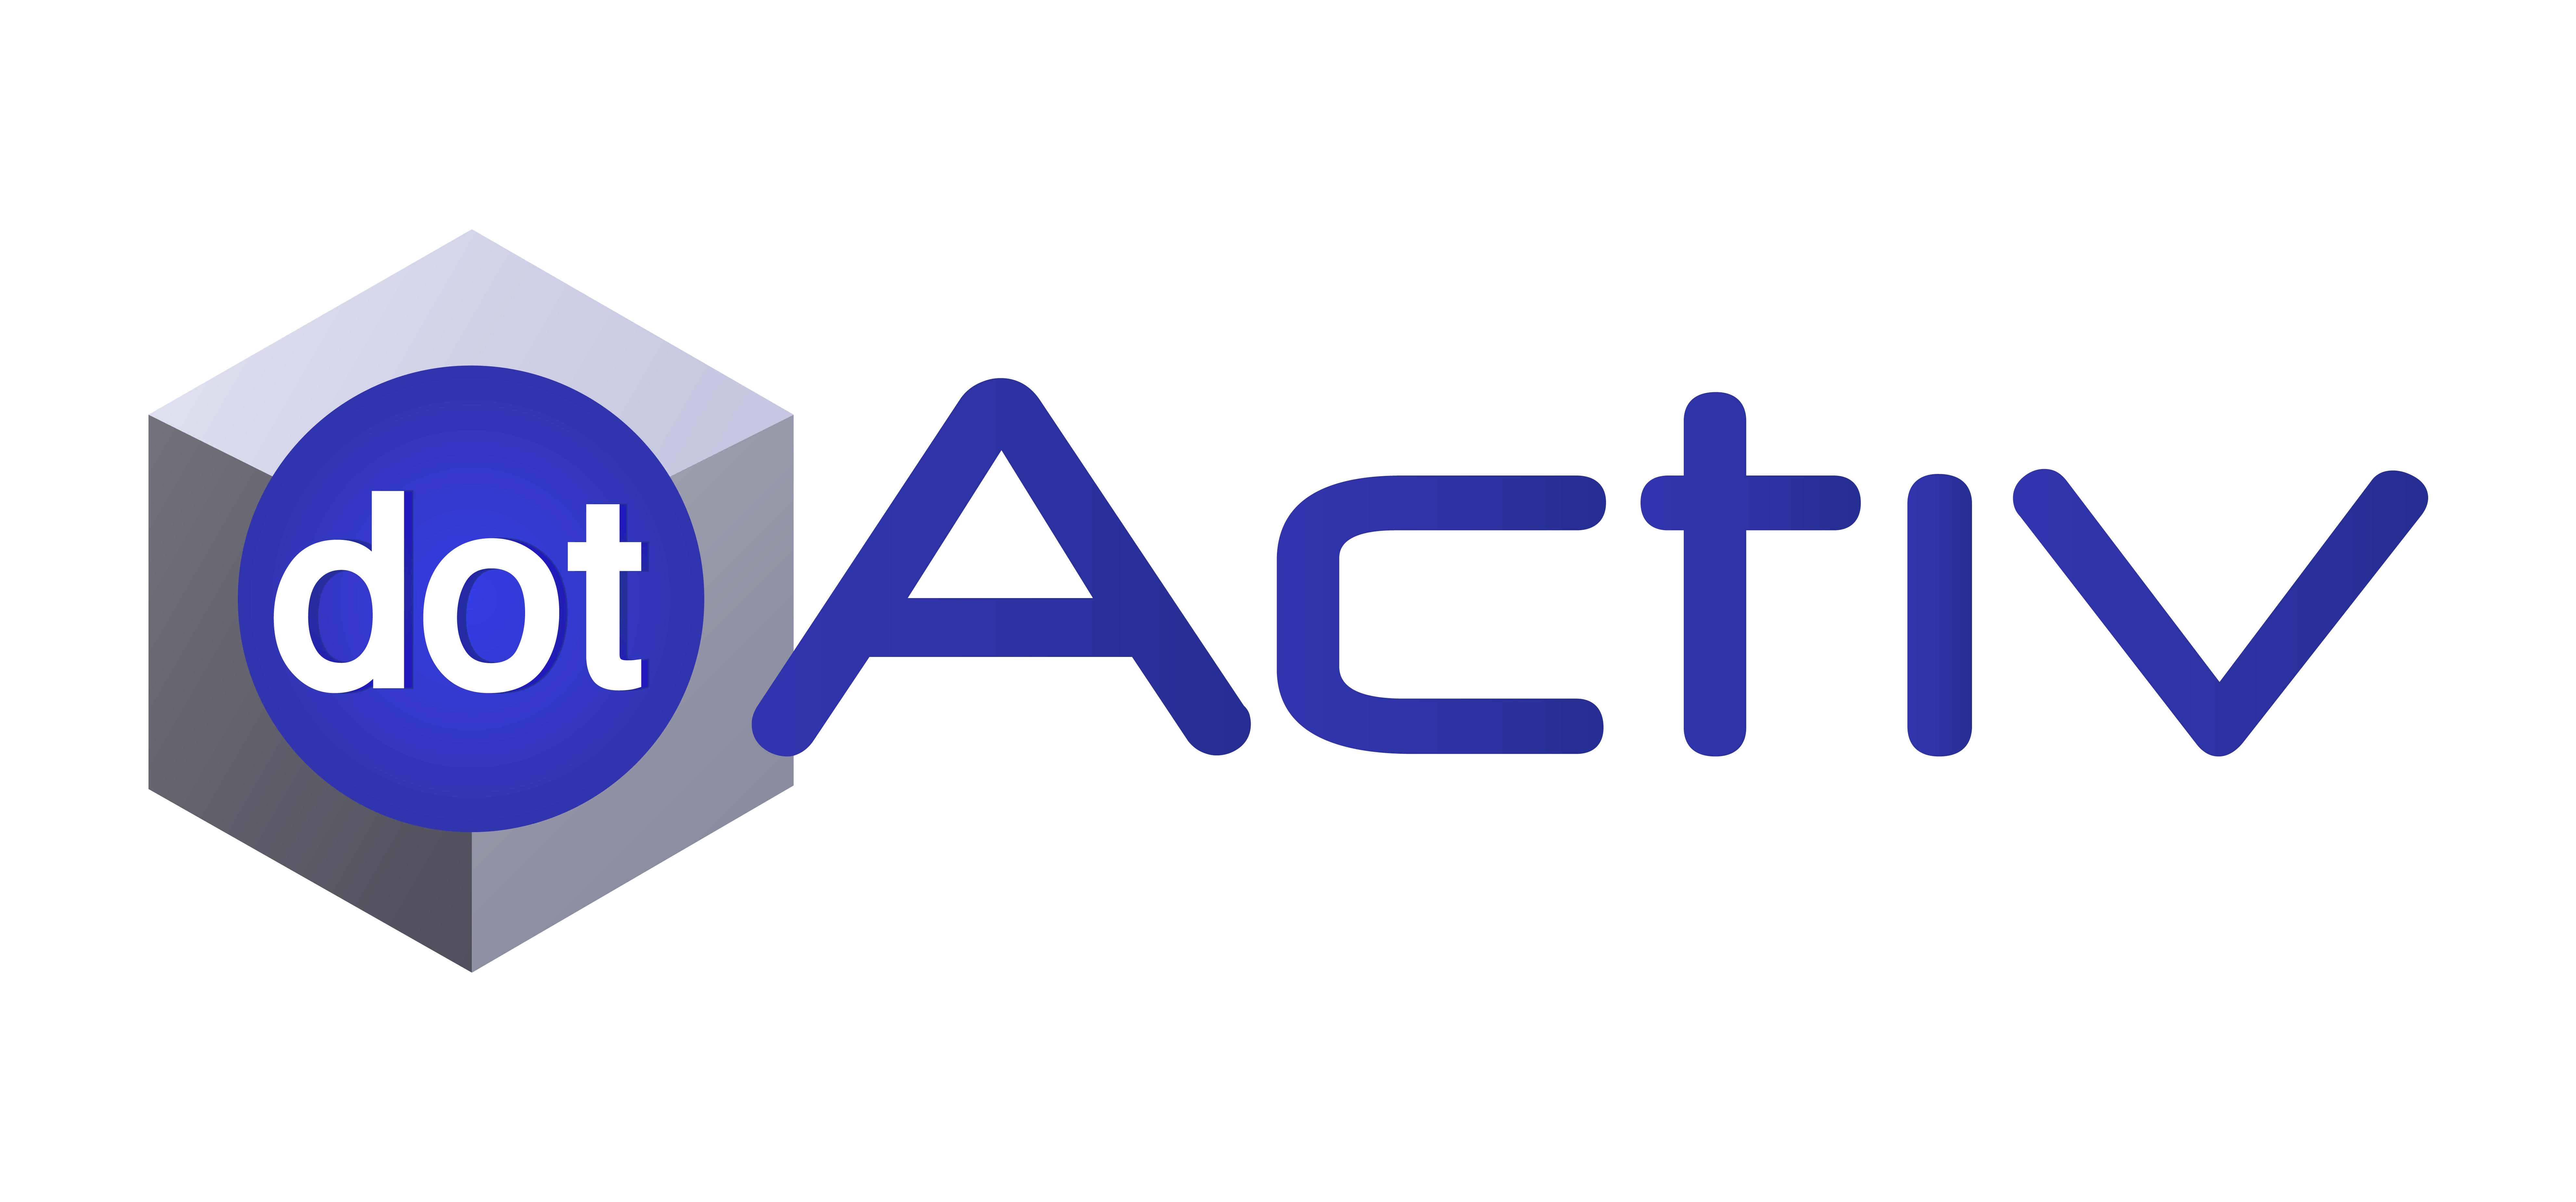 DotActiv - Leading Category Management Software